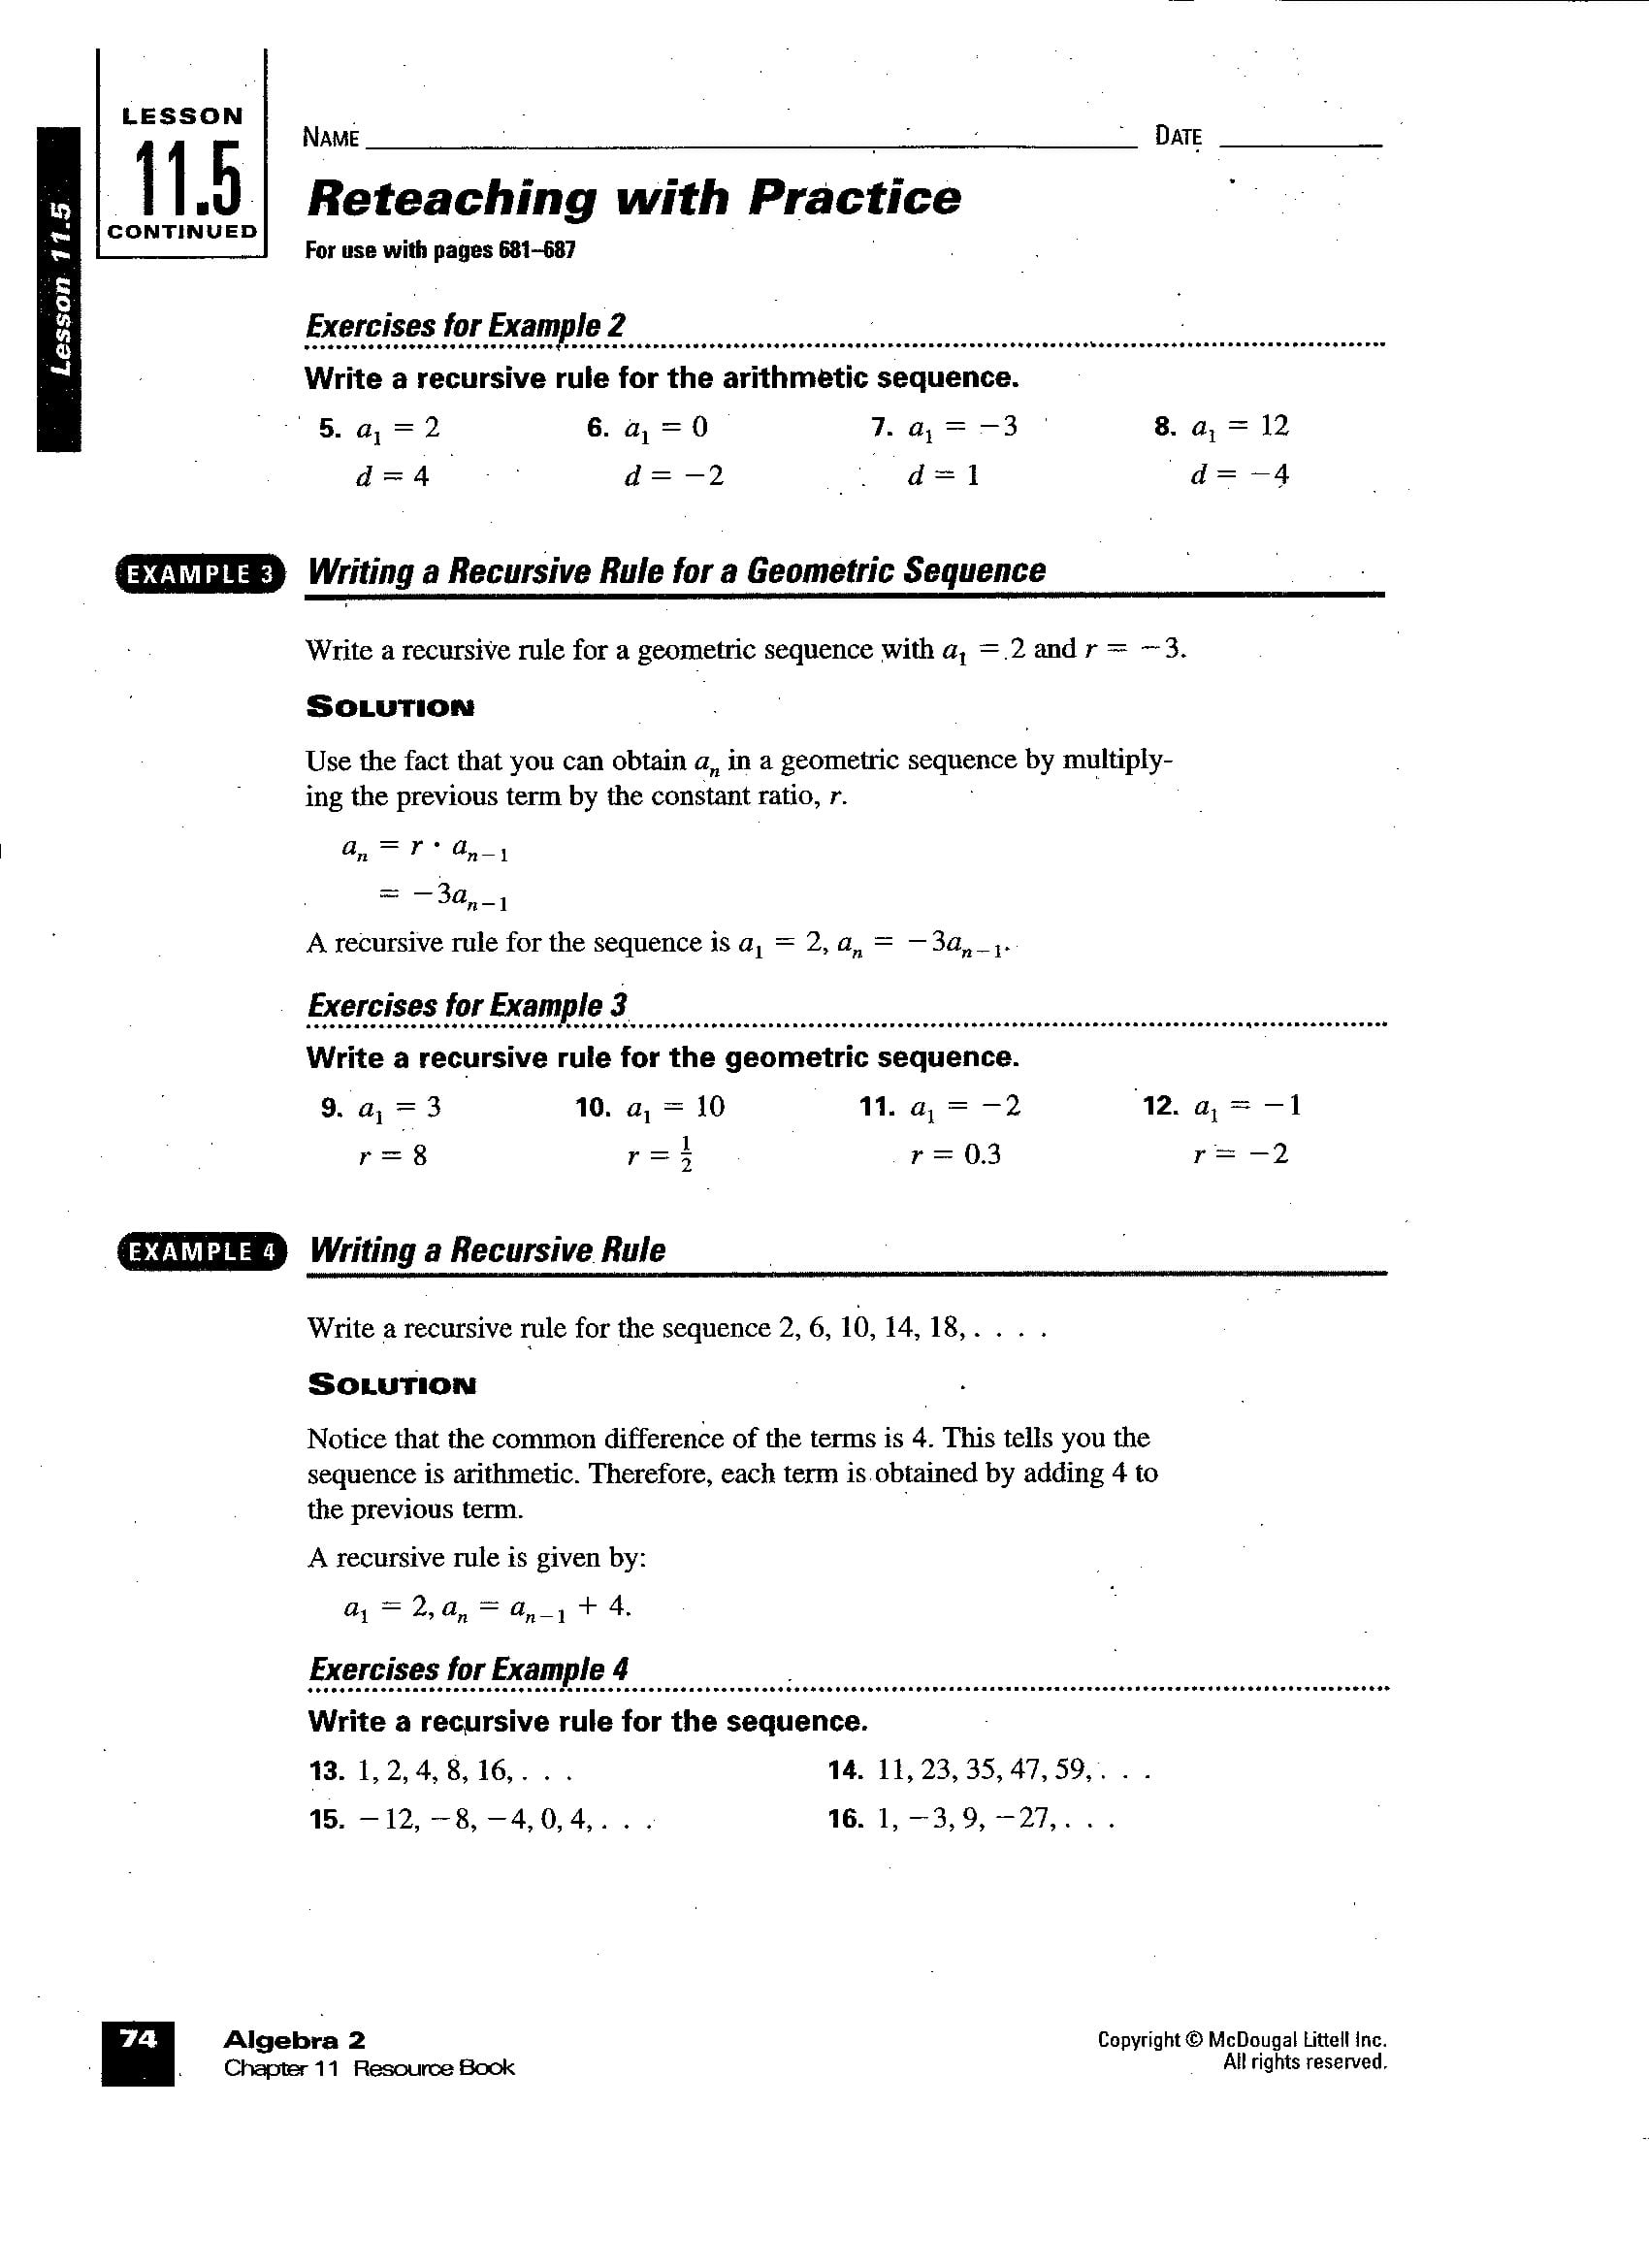 Arithmetic Sequence Worksheet Algebra 1 Db Excel